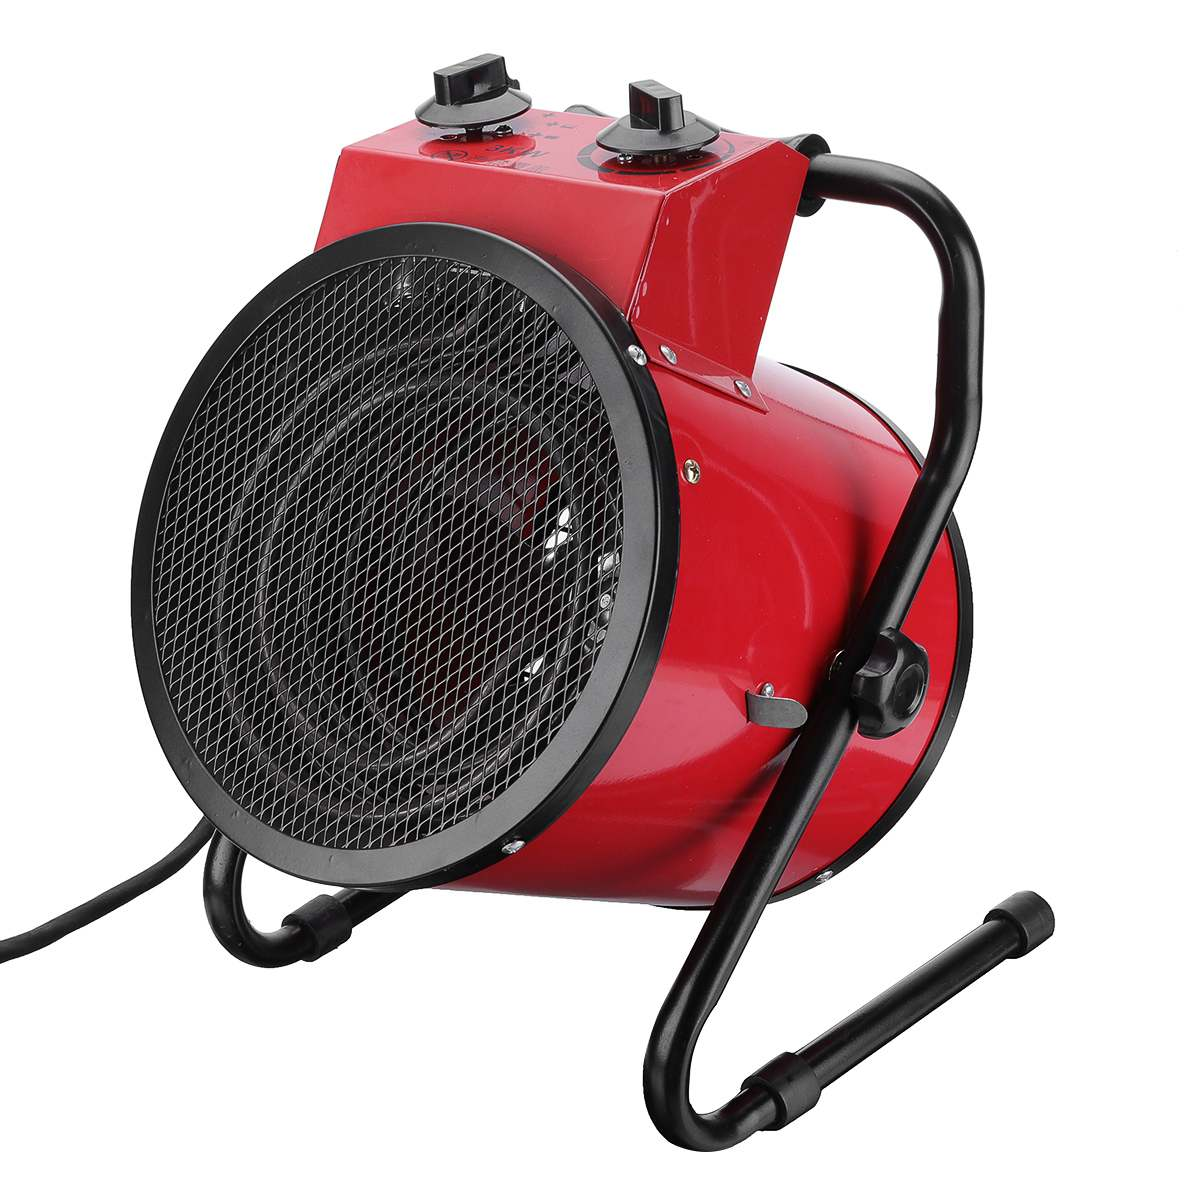 3000W Industrial Electric Heater Fan Commercial Warm Heater Blower Air Workshop Space Garage Heating Appliances 220V Adjustable